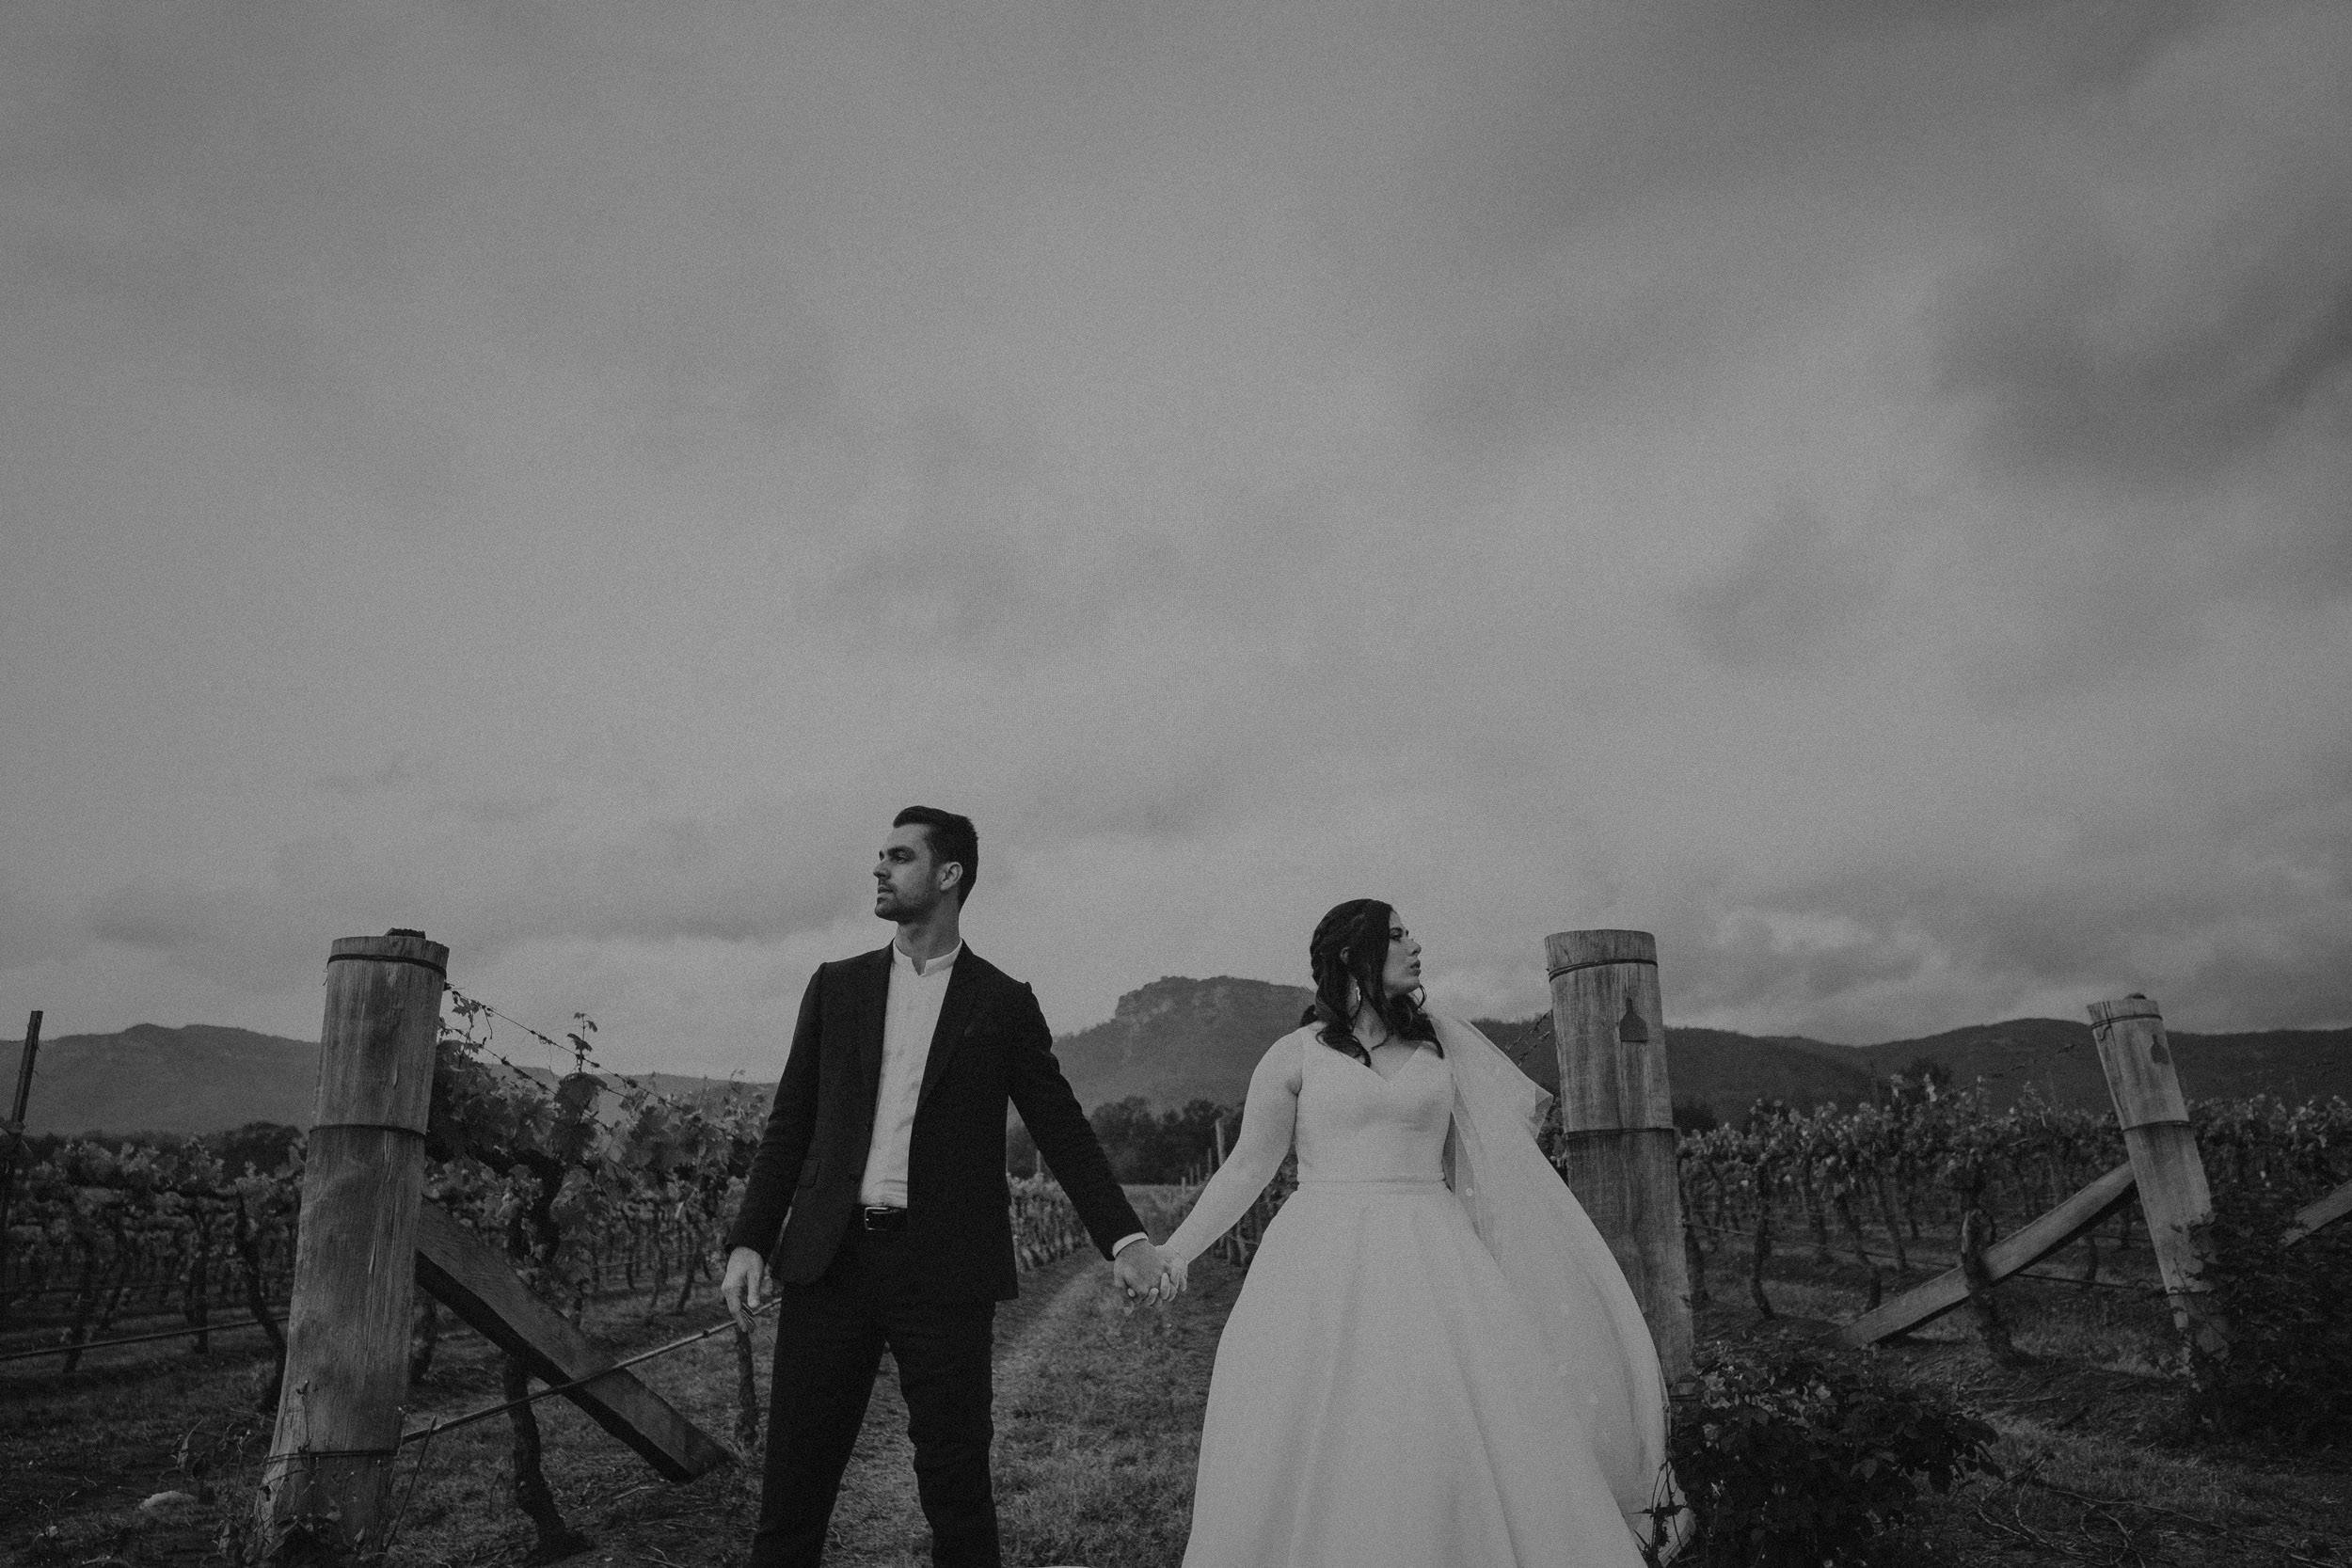 s+j_top_elopement wedding photography_kings & thieves_blog - 430.jpg